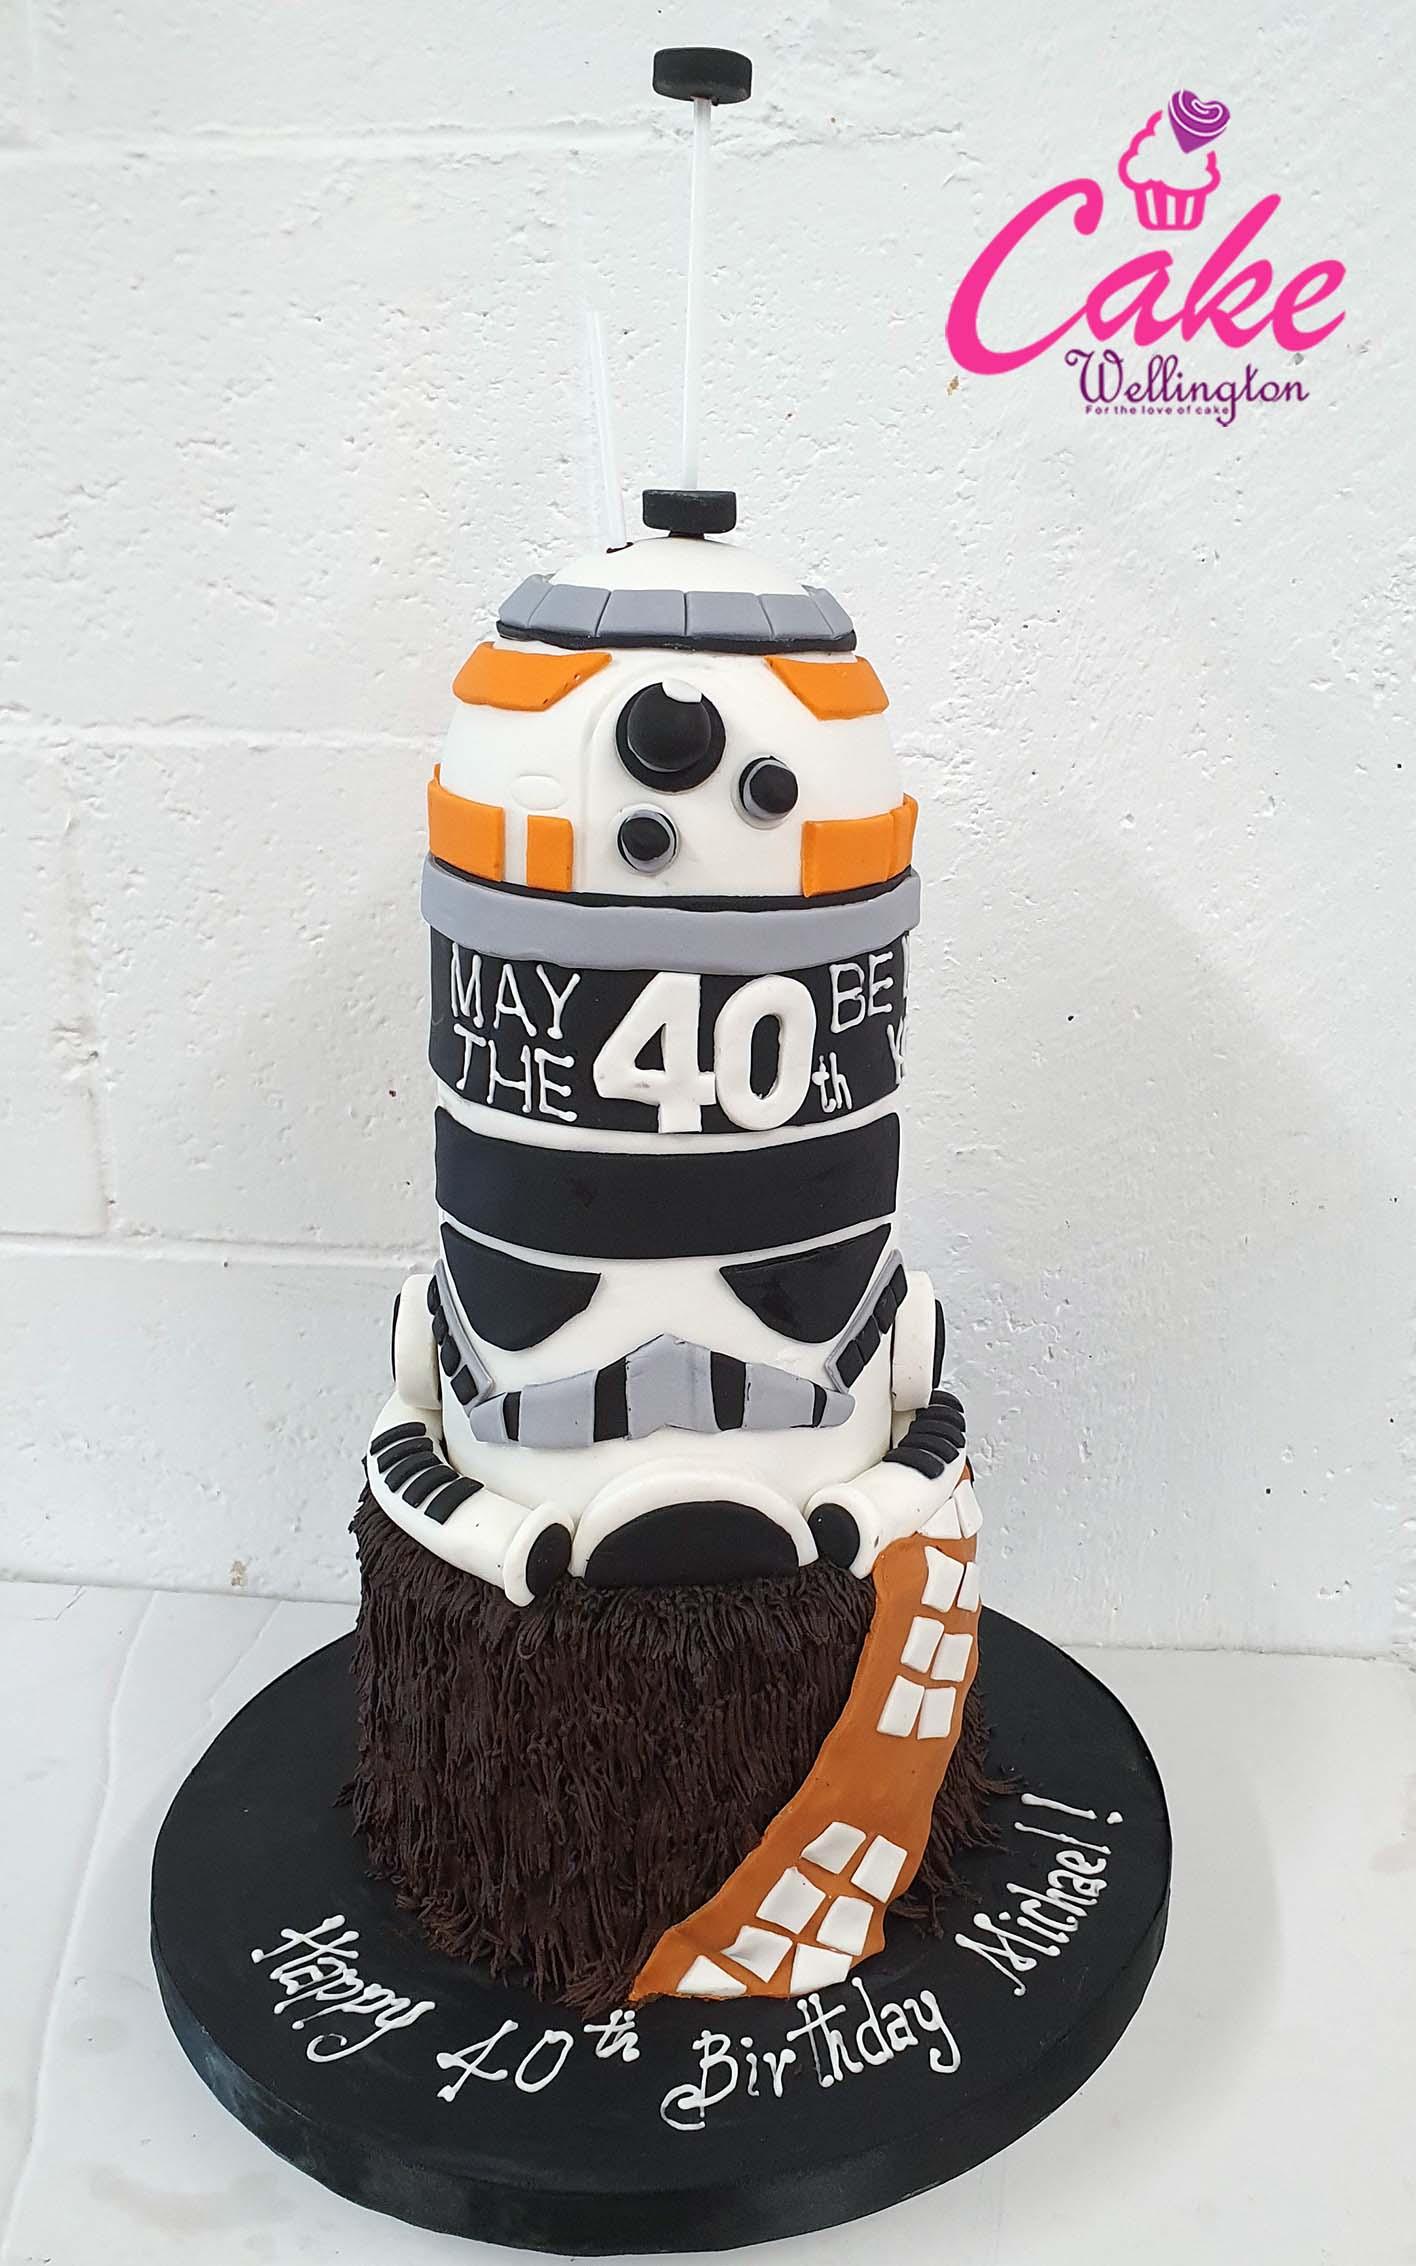 Marvelous 40Th Birthday Cake Cake Wellington Funny Birthday Cards Online Elaedamsfinfo